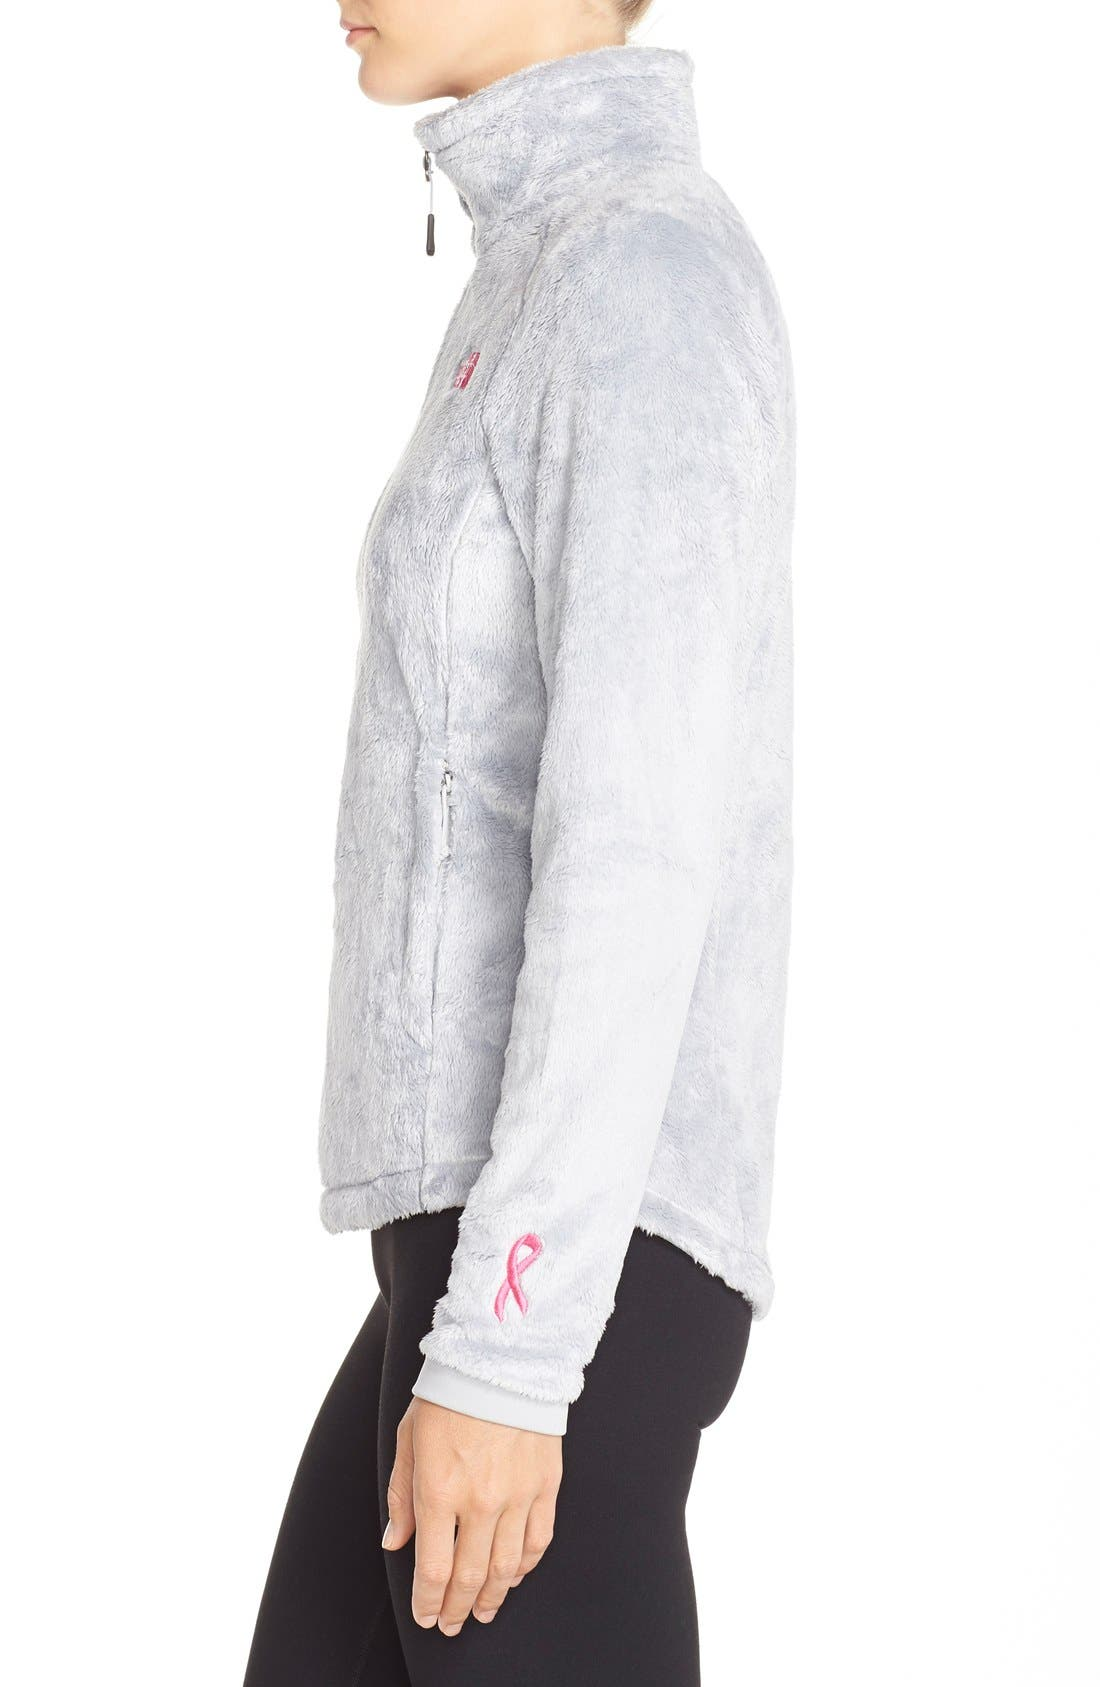 THE NORTH FACE, 'Osito 2 - Pink Ribbon' Fleece Jacket, Alternate thumbnail 2, color, 030